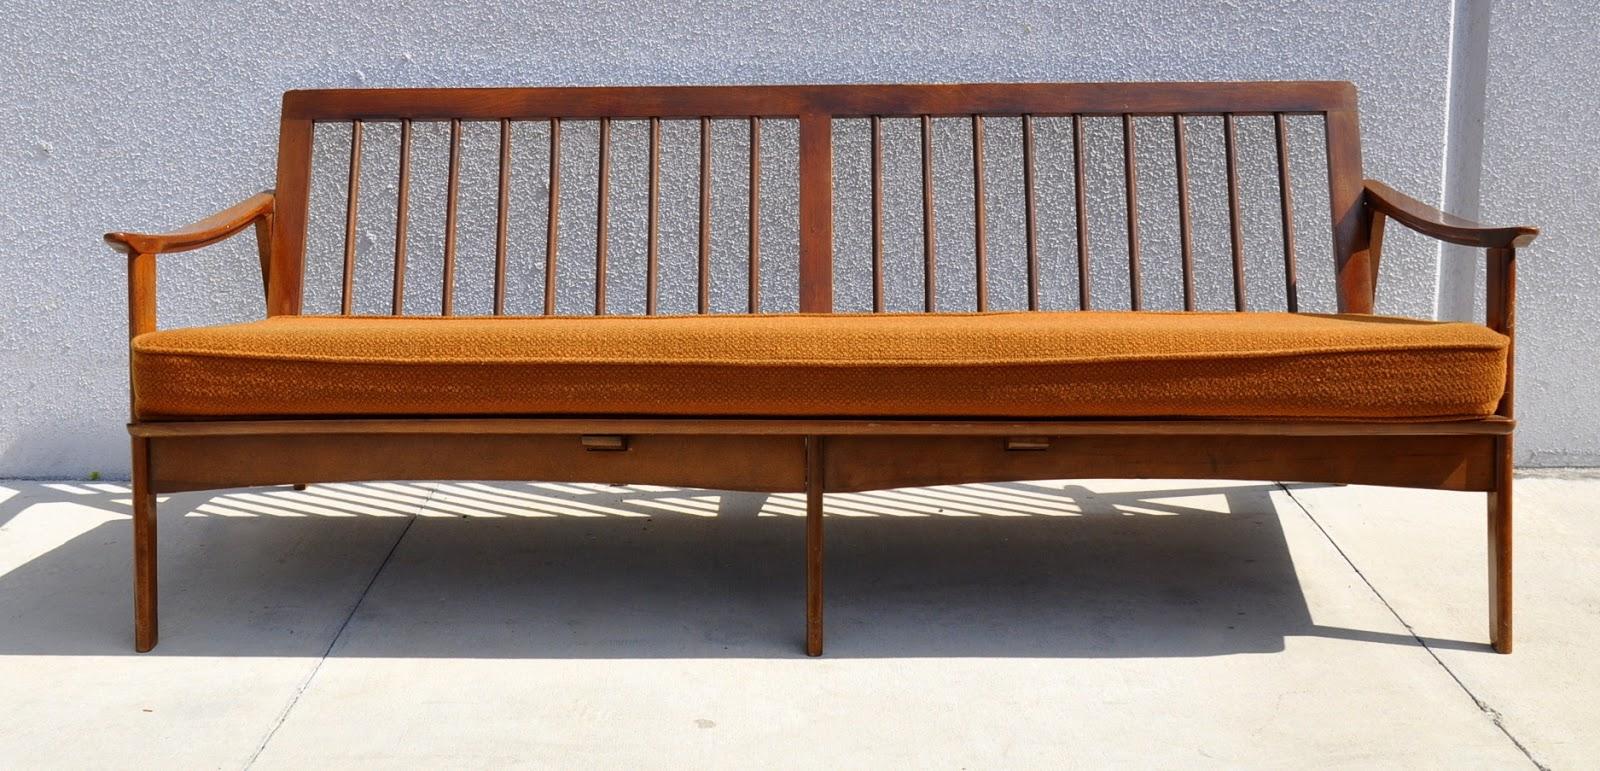 Danish Modern Sofa Bed Furniture Italy Select